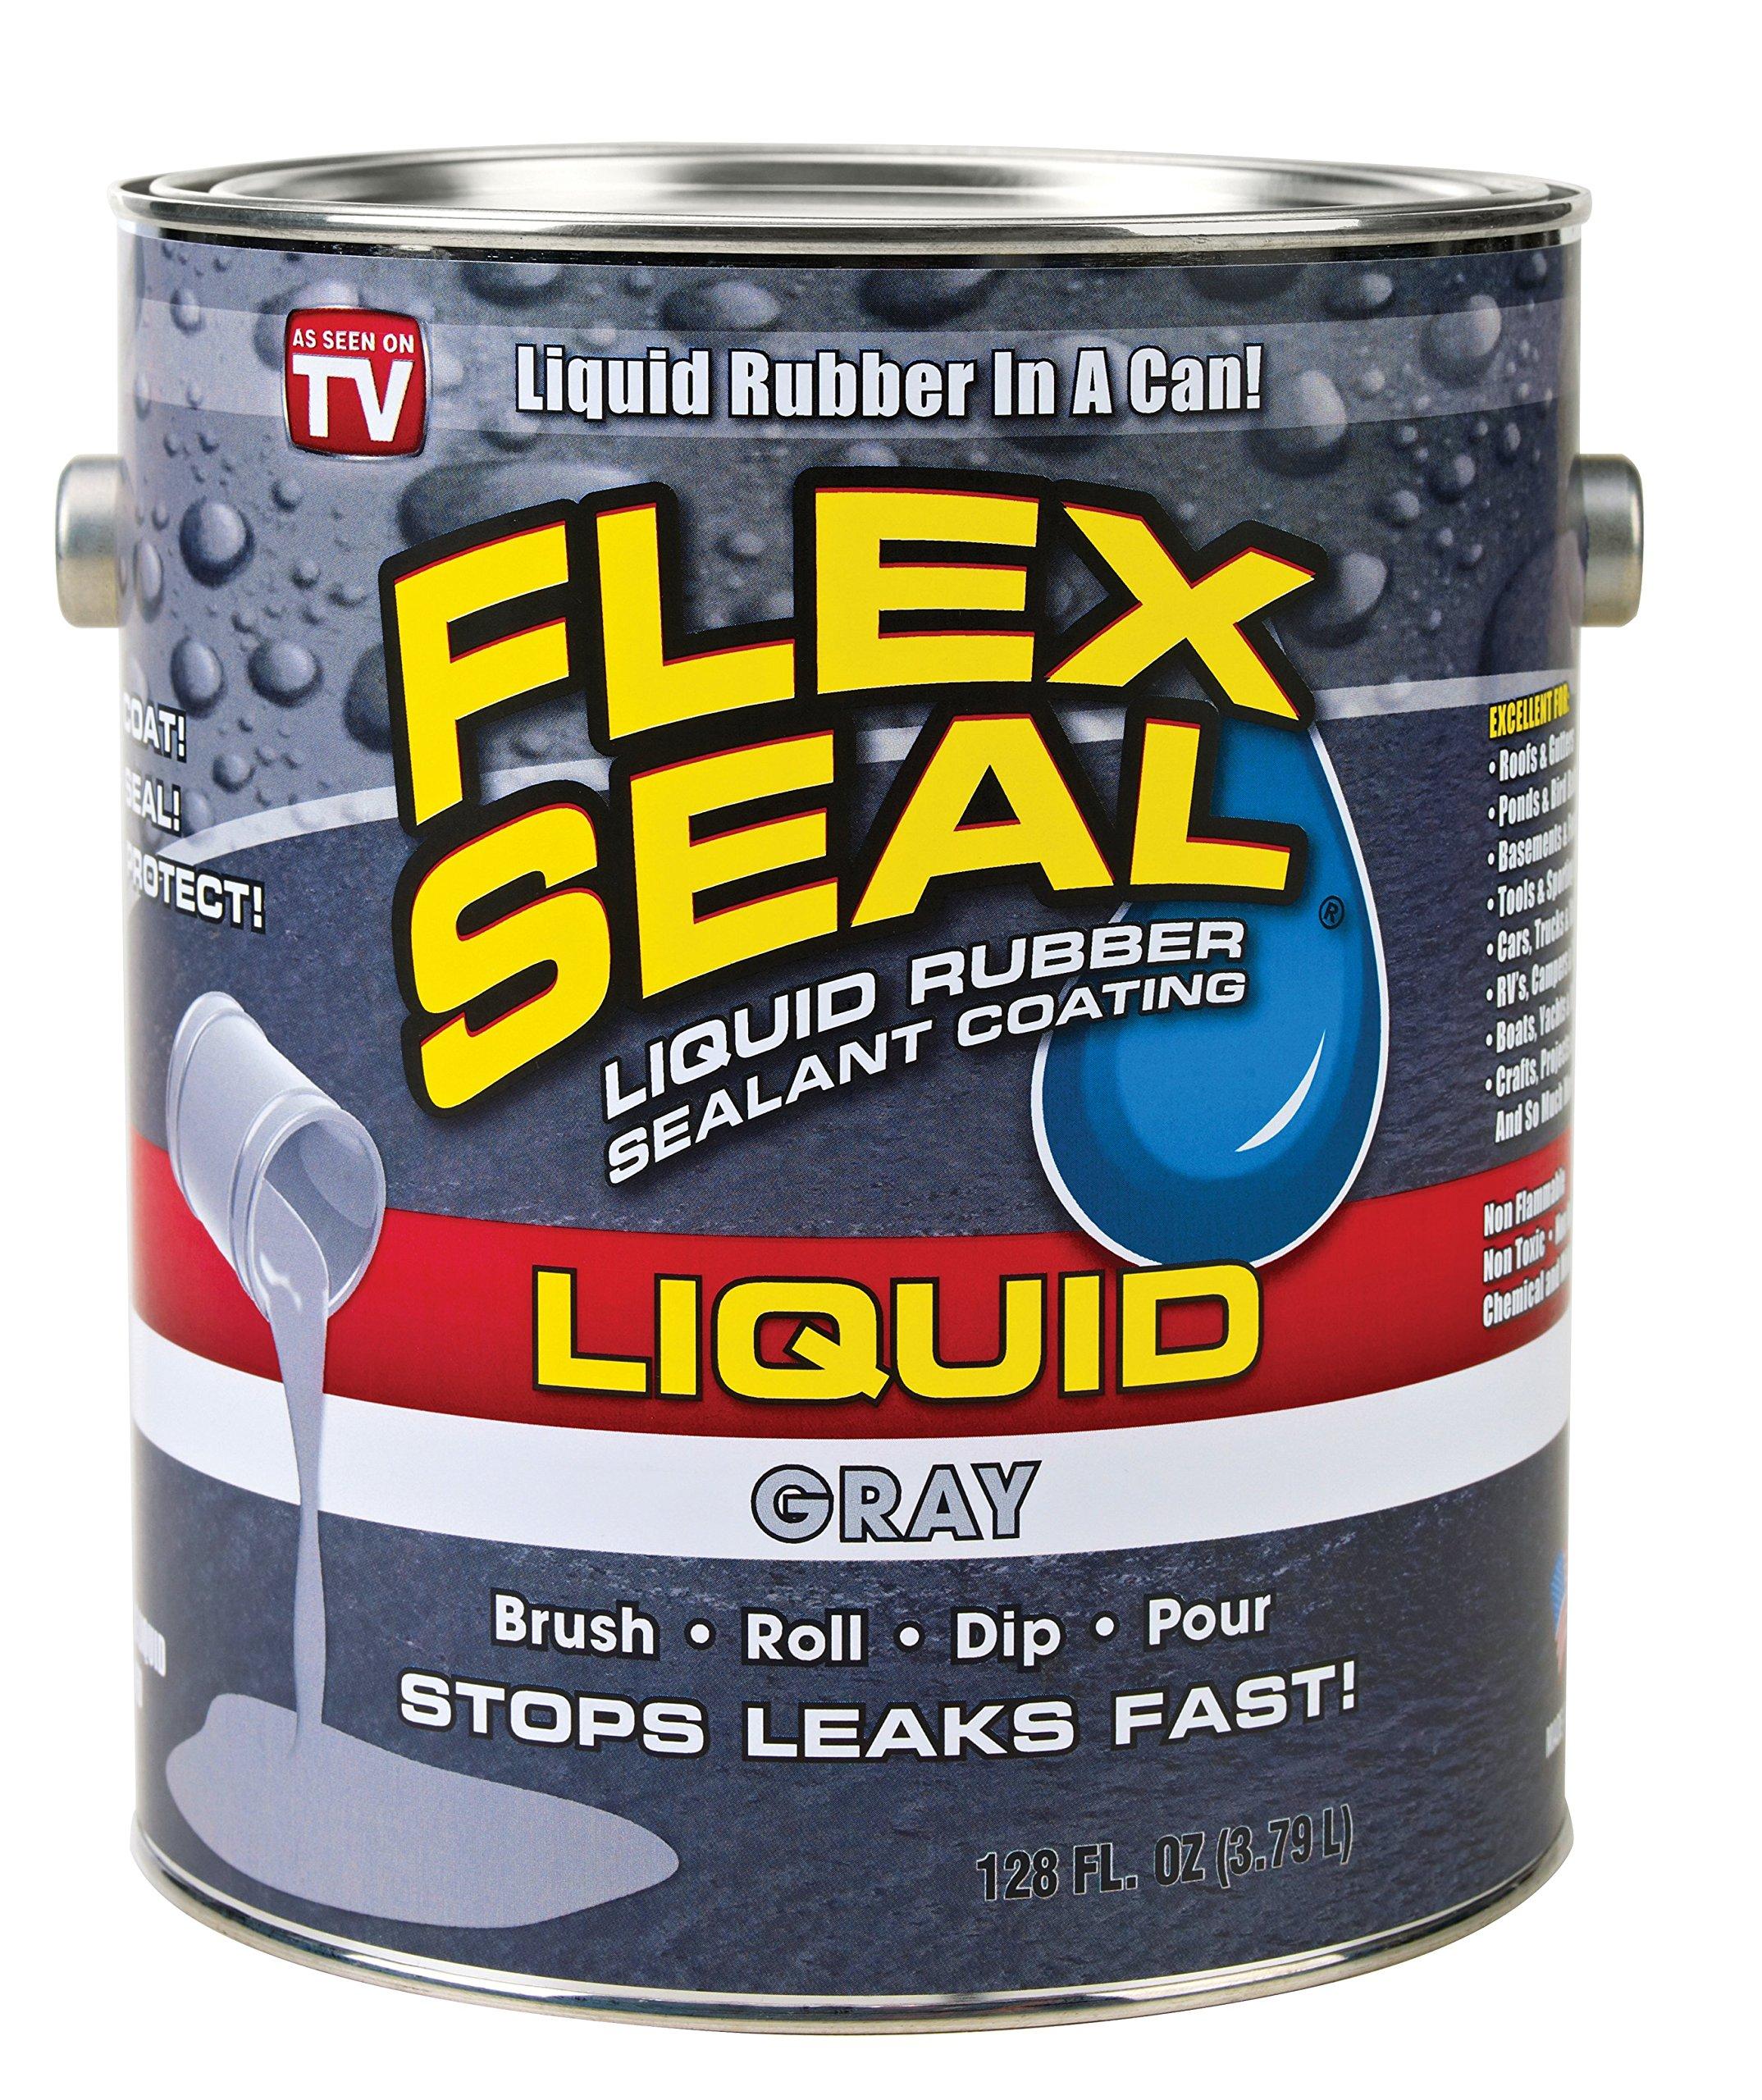 Flex Seal Liquid Rubber in a Can, 1-gal, Gray